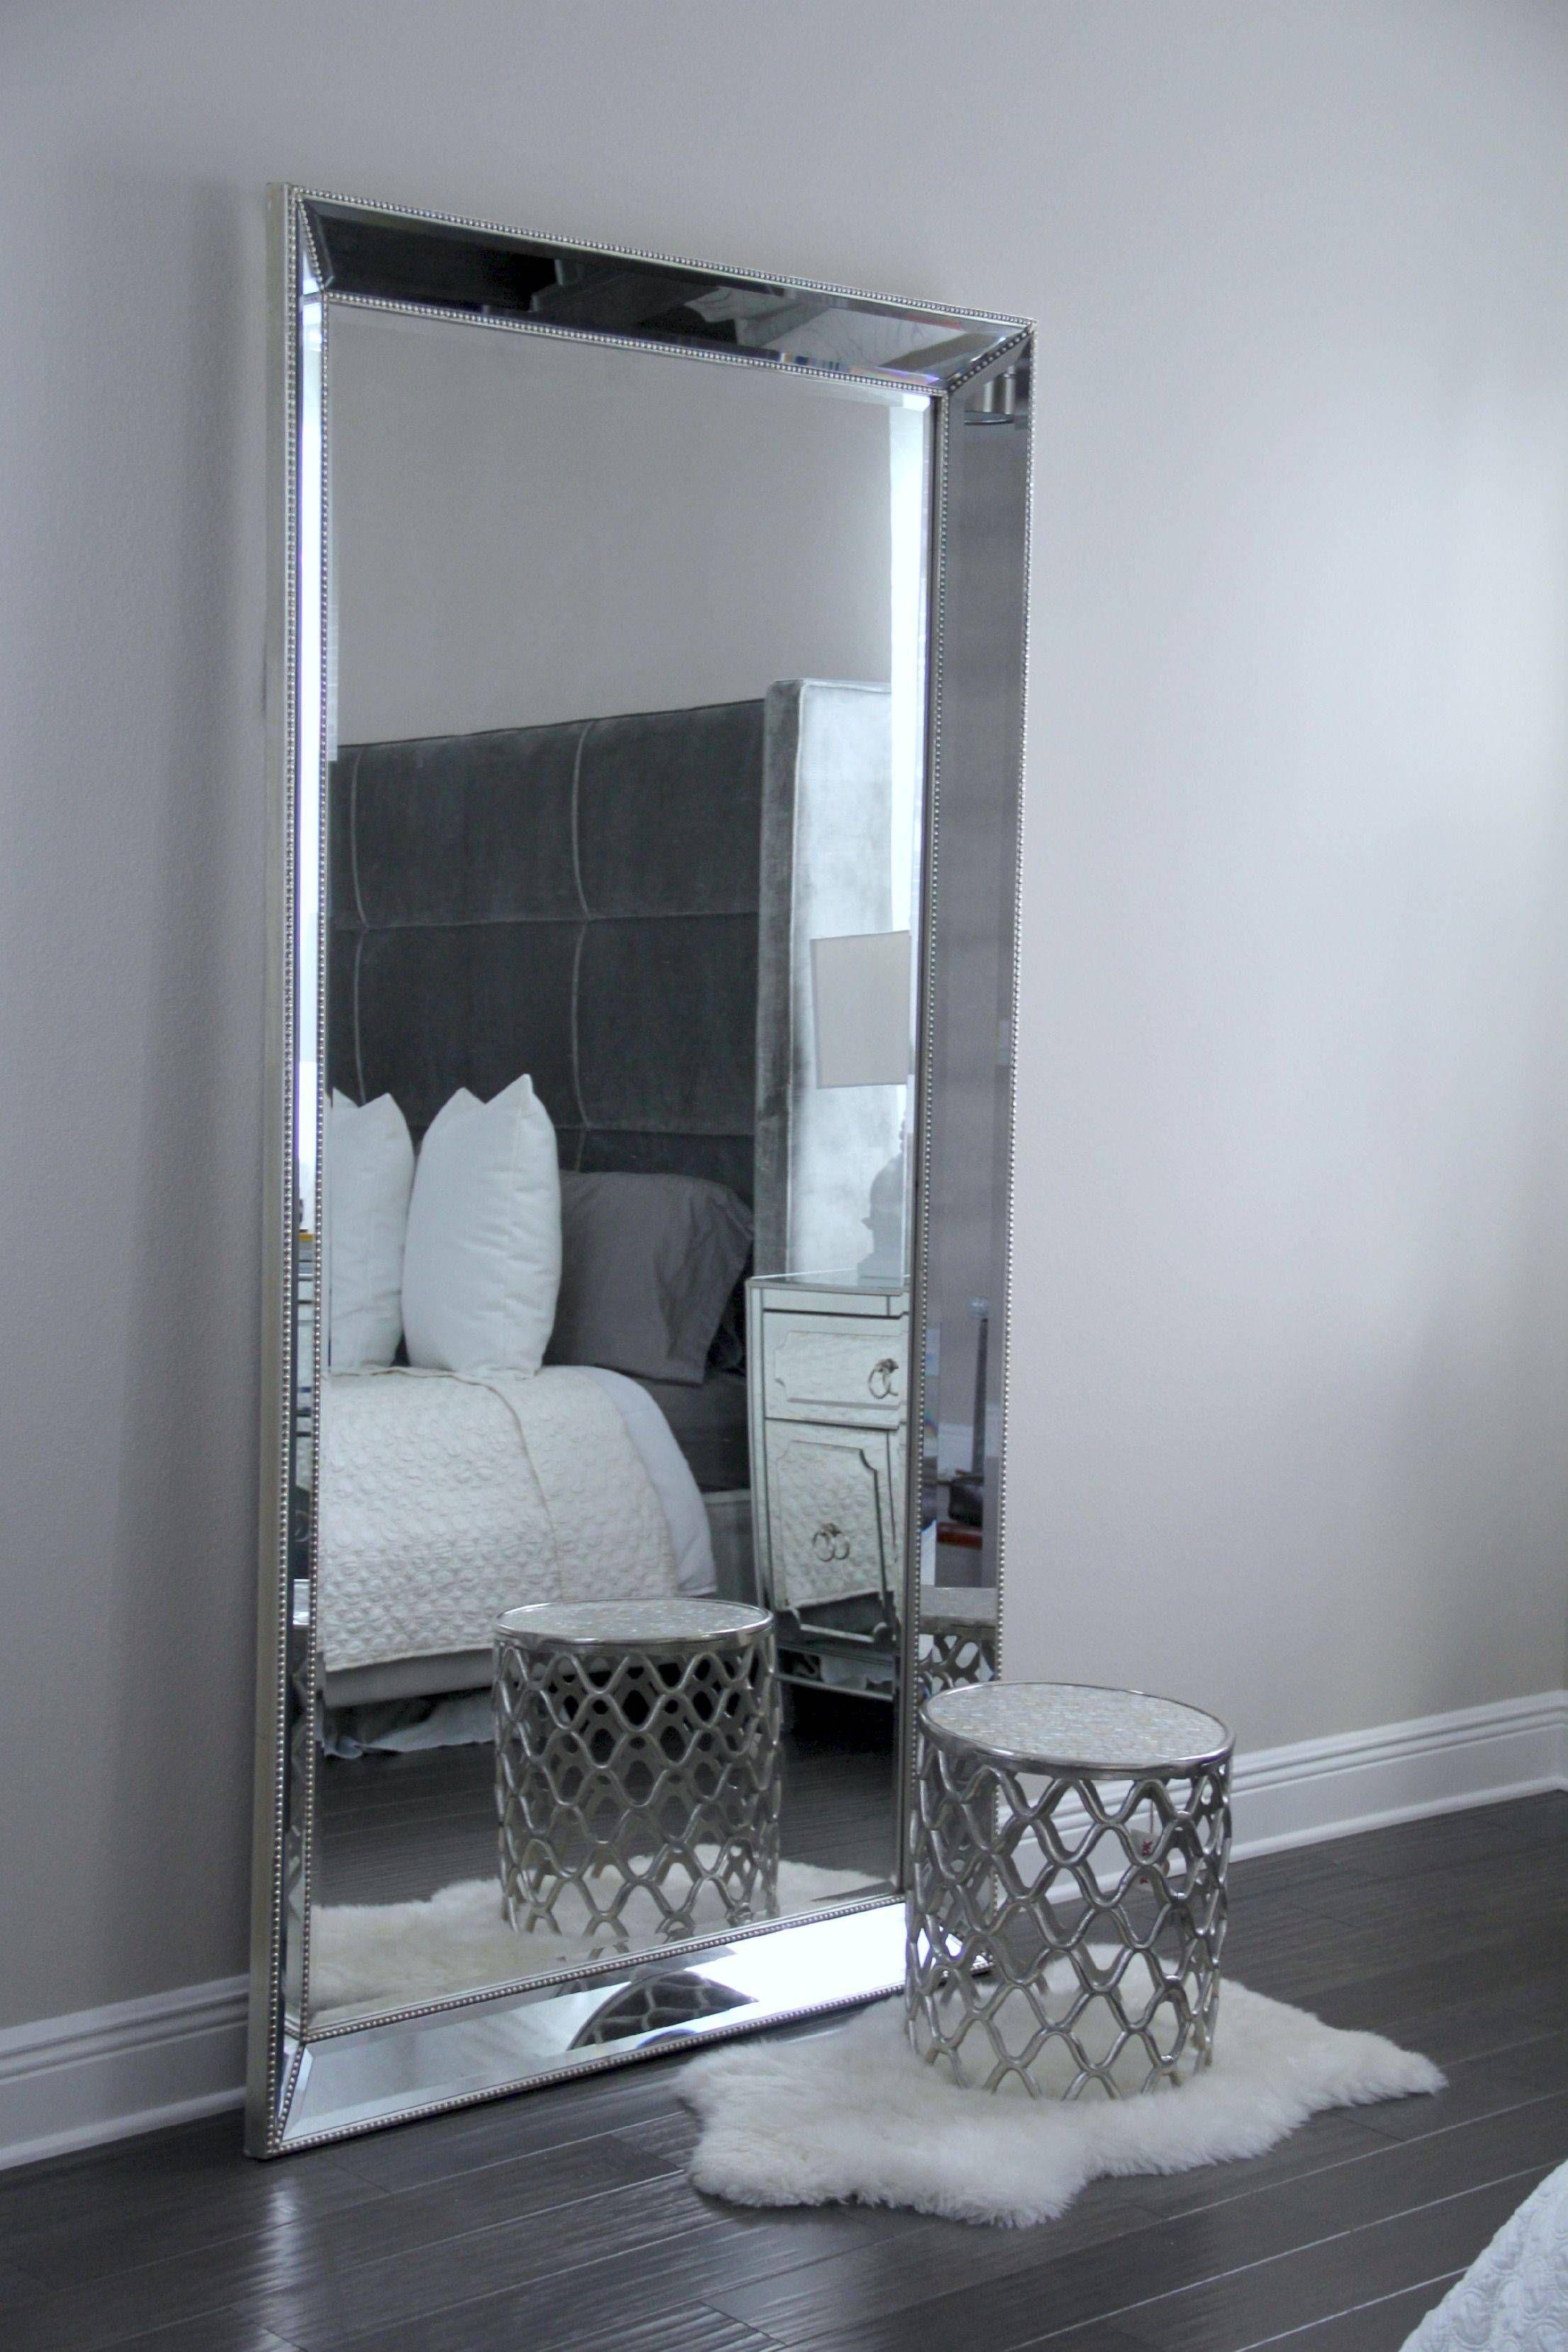 Decorative Full Length Mirror More Image Visite Mirrored Bedroom Furniture Home Decor Room Decor